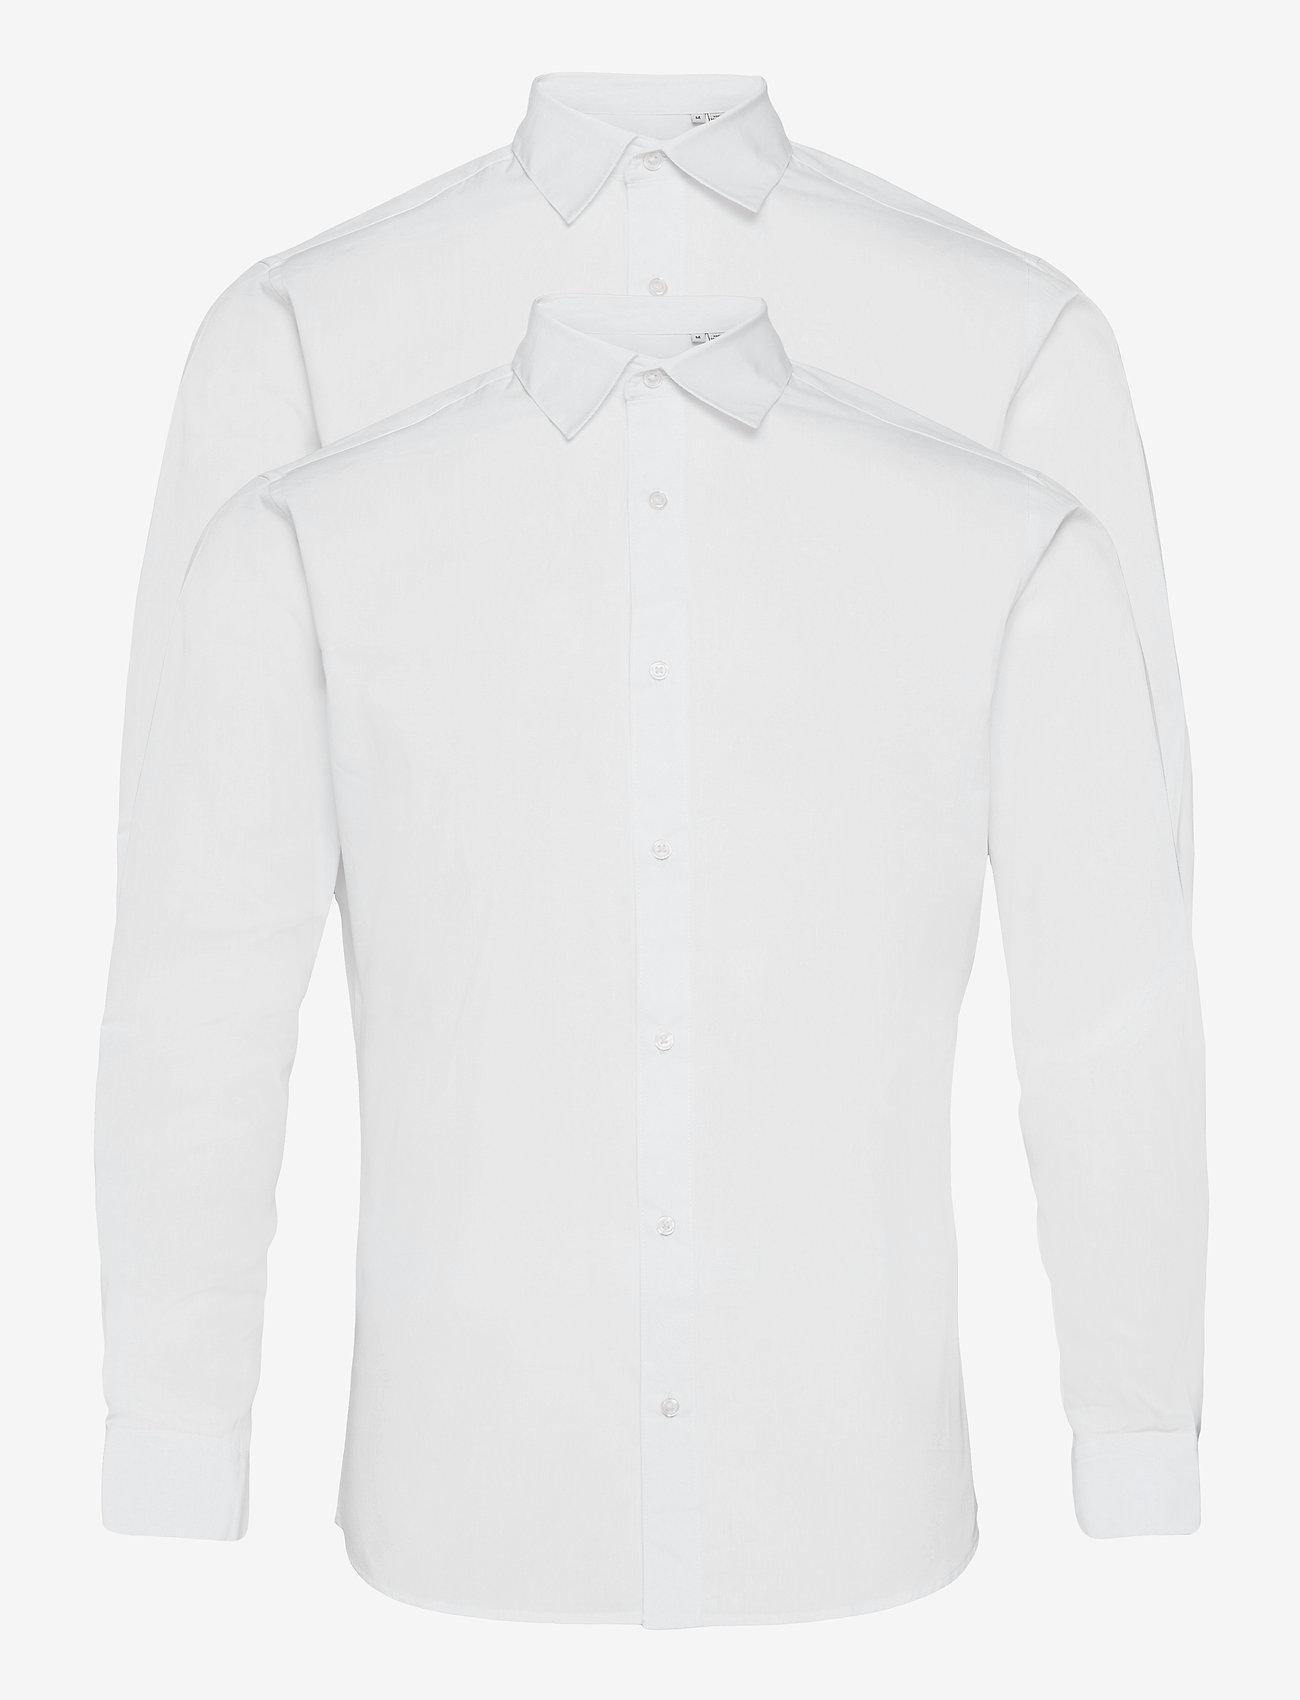 Jack & Jones - JJJOE SHIRT LS 2 PACK - basic skjortor - white - 0